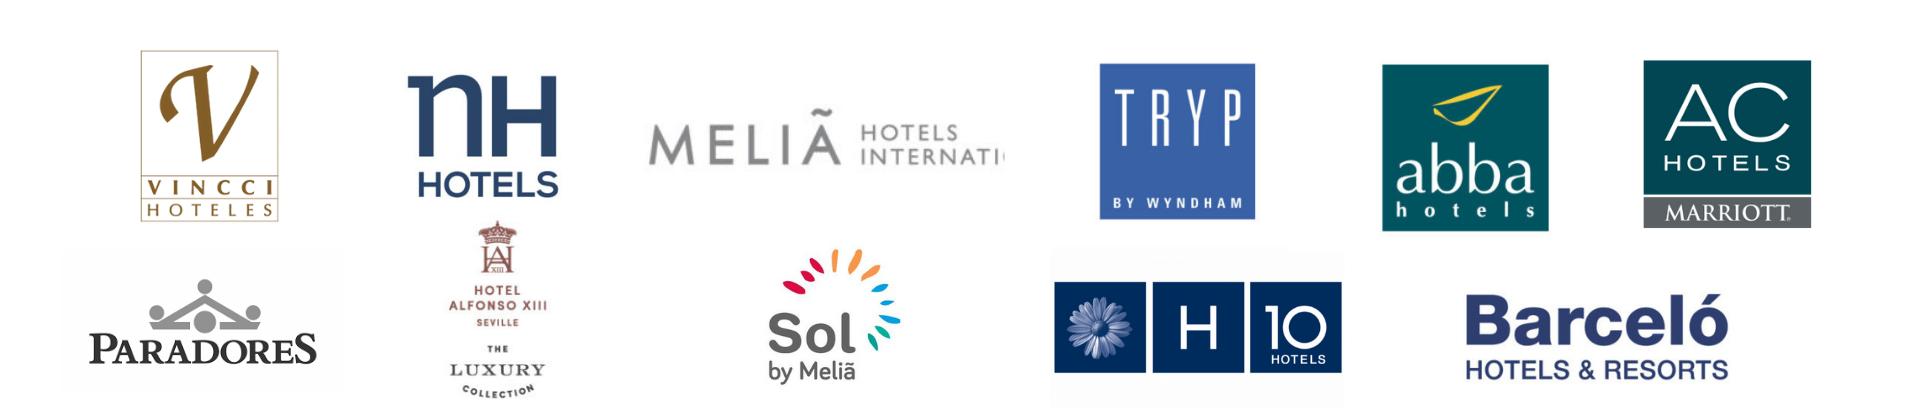 logos hotel